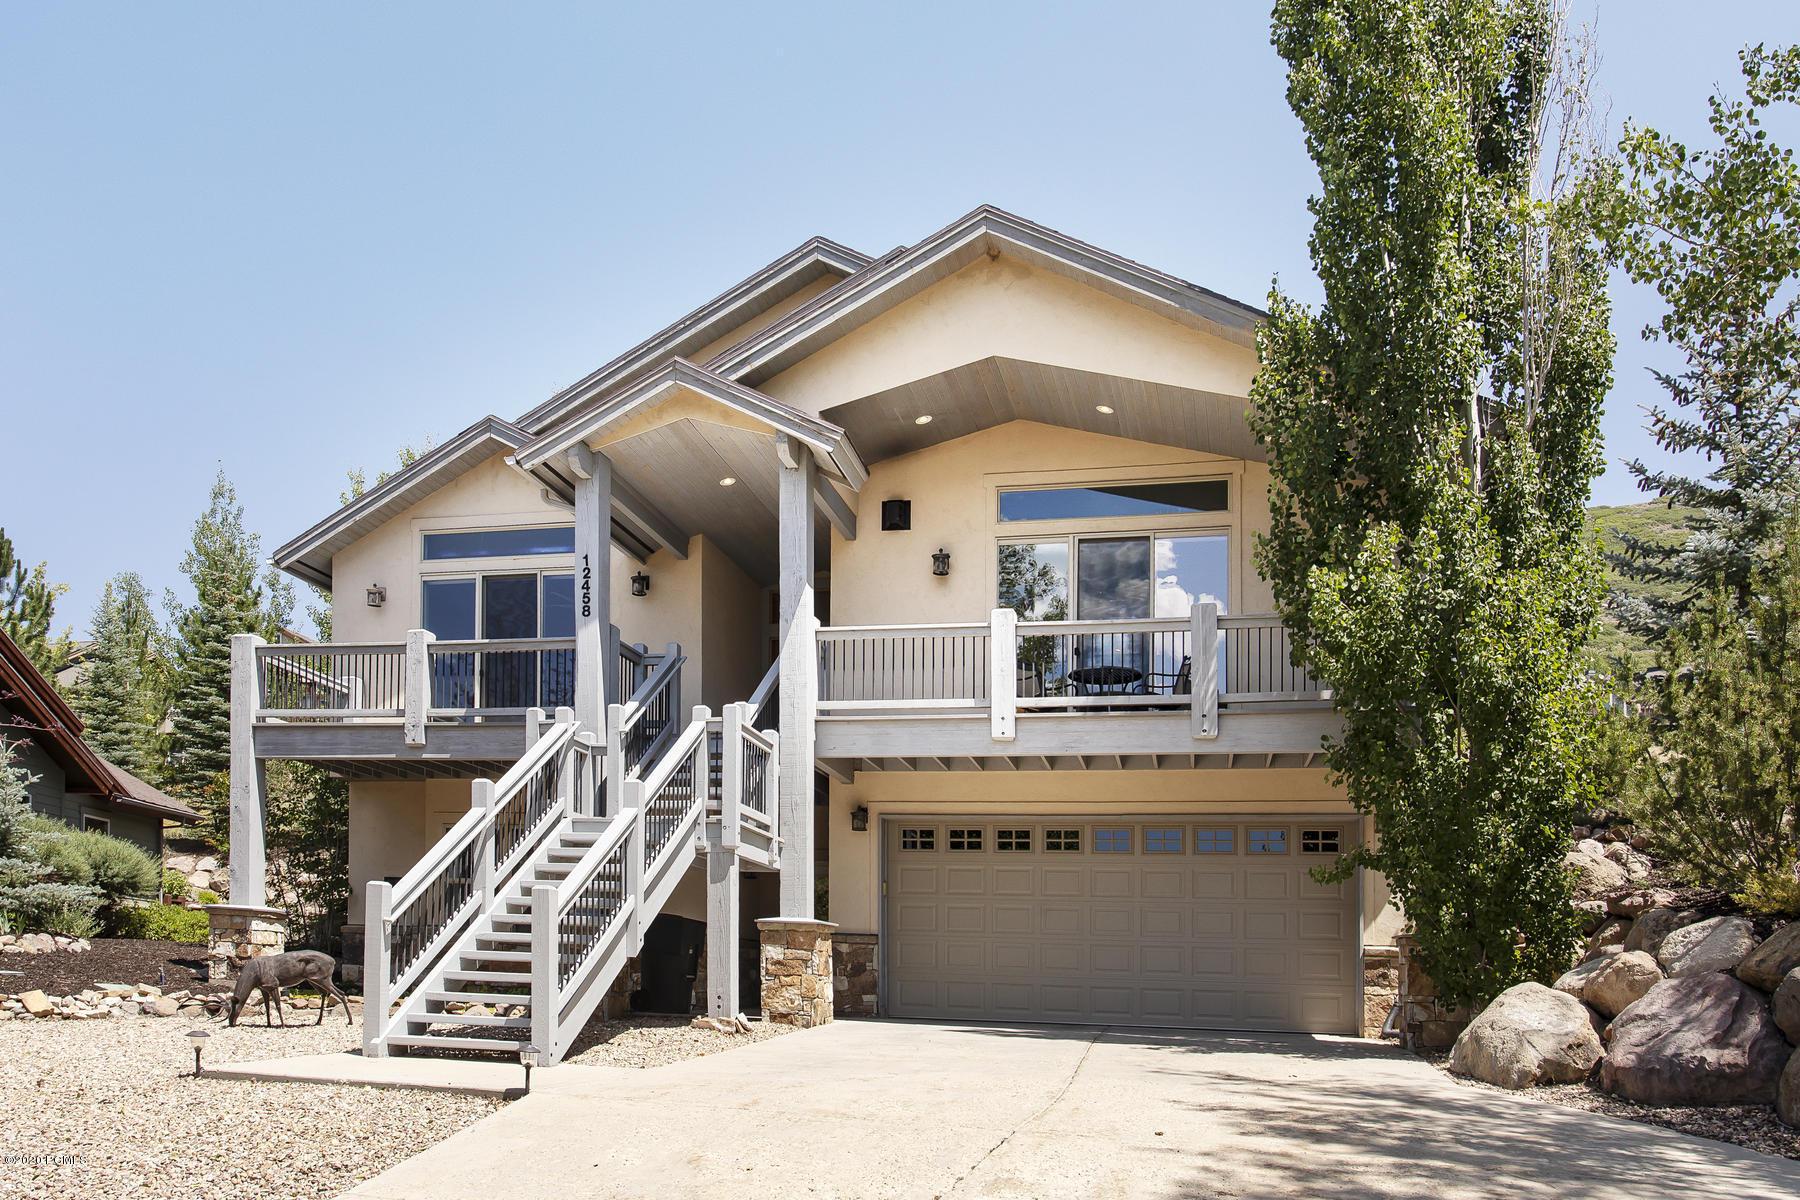 12458 Ross Creek Drive, Kamas, Utah 84036, 4 Bedrooms Bedrooms, ,3 BathroomsBathrooms,Single Family,For Sale,Ross Creek,12002785